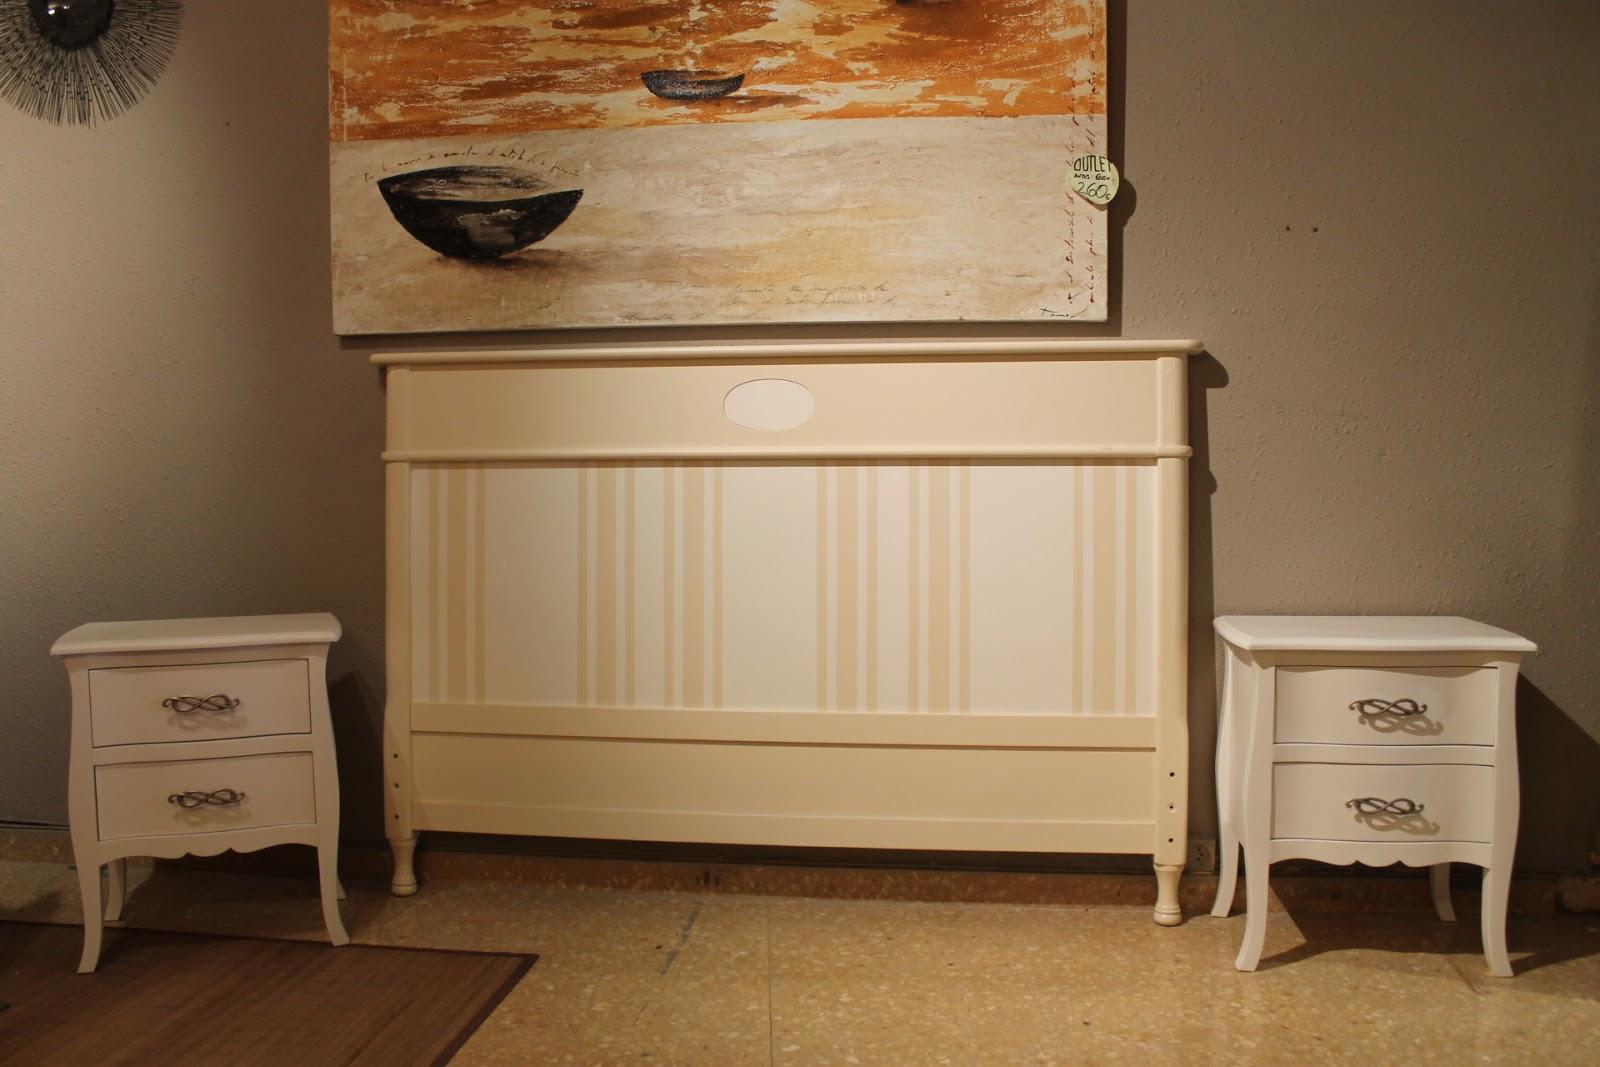 Icono interiorismo 8 feria outlet del mueble de n jera for Outlet del mueble